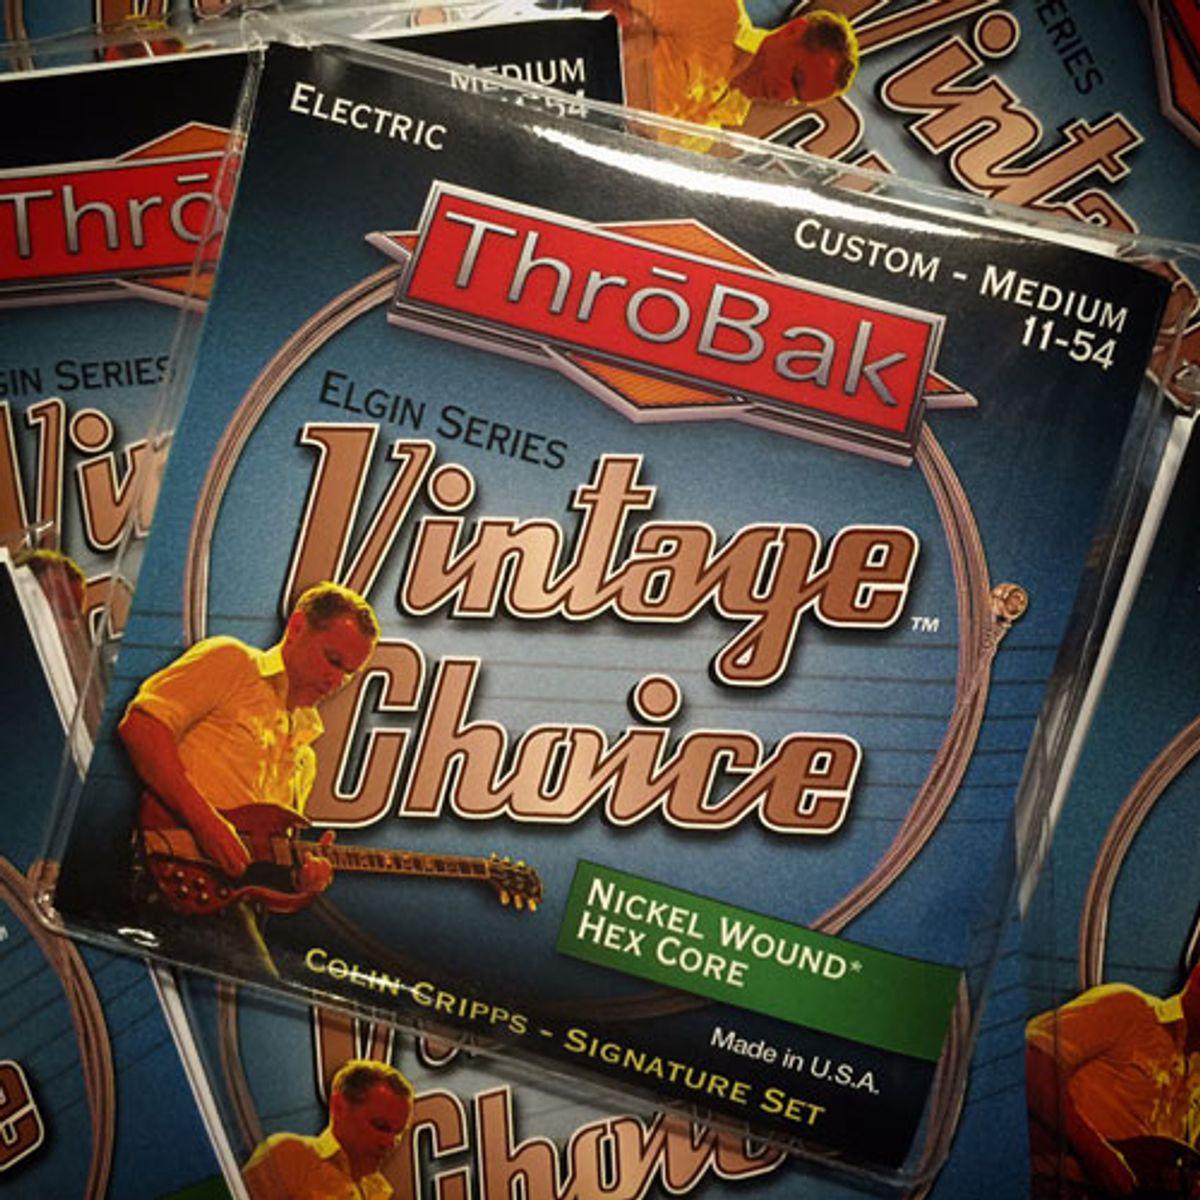 ThroBak Introduces Colin Cripps Signature Strings